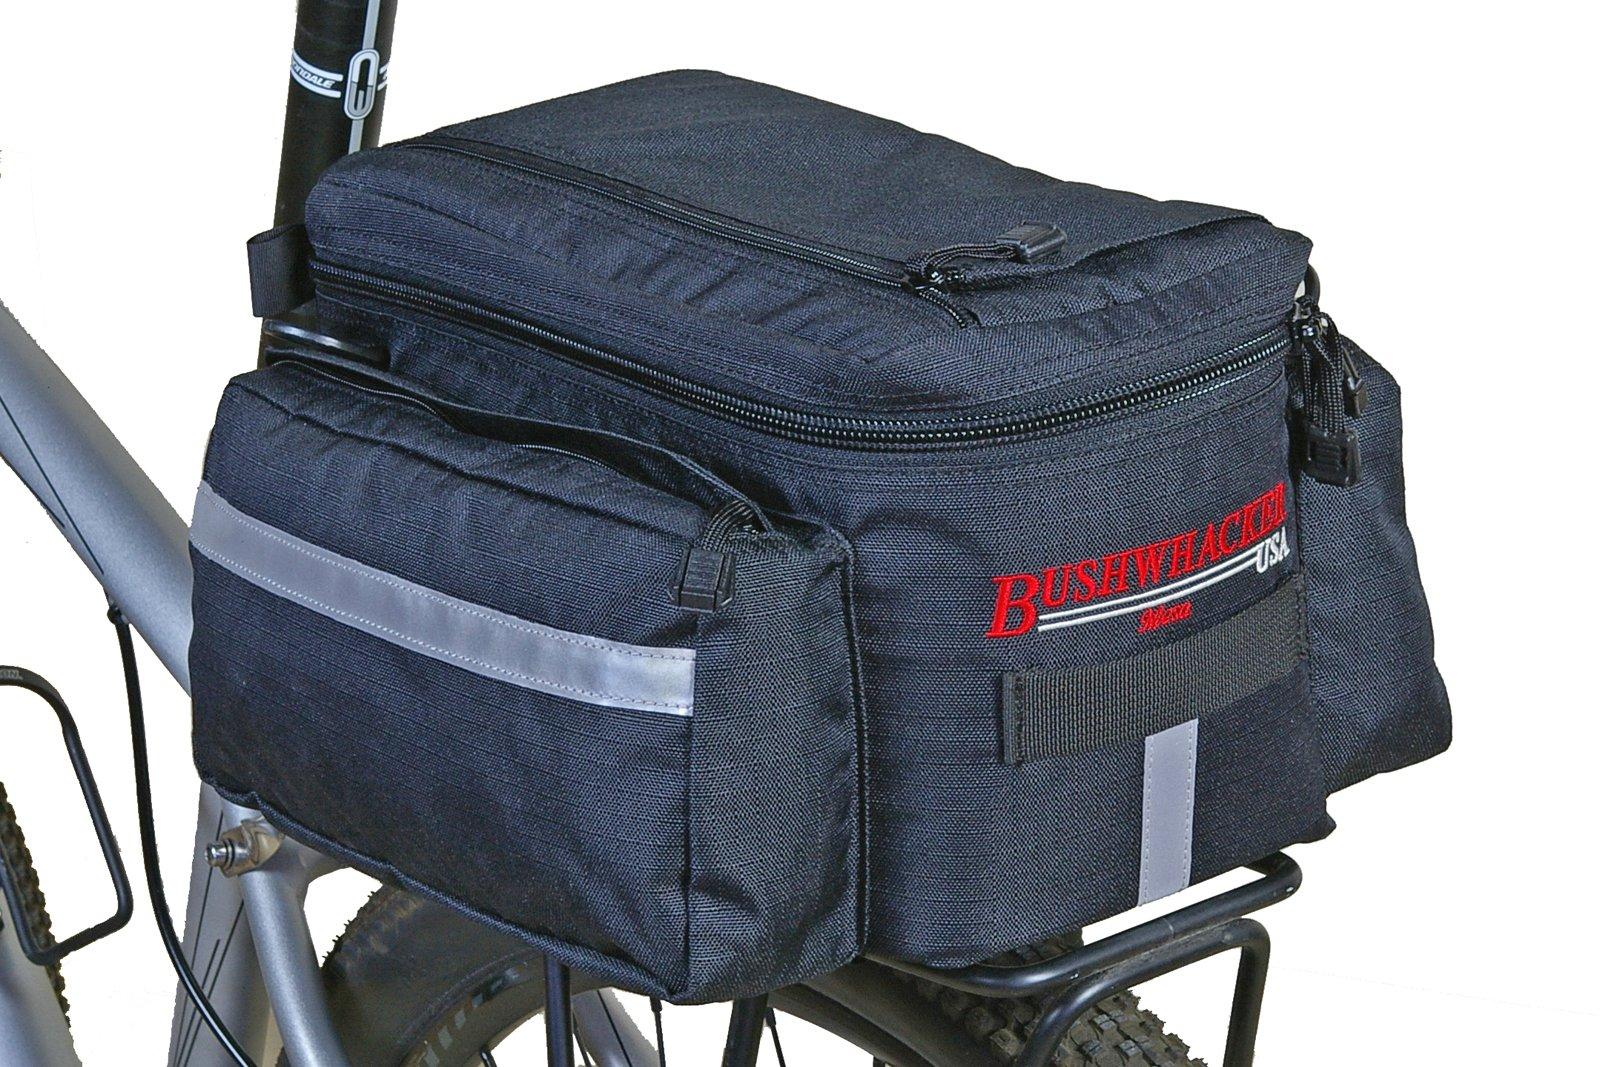 Bushwhacker® Mesa Trunk Bag Black - w/ Rear Light Clip Attachment & Reflective Trim - Bicycle Trunk Bag Cycling Rack Pack Bike Rear Bag